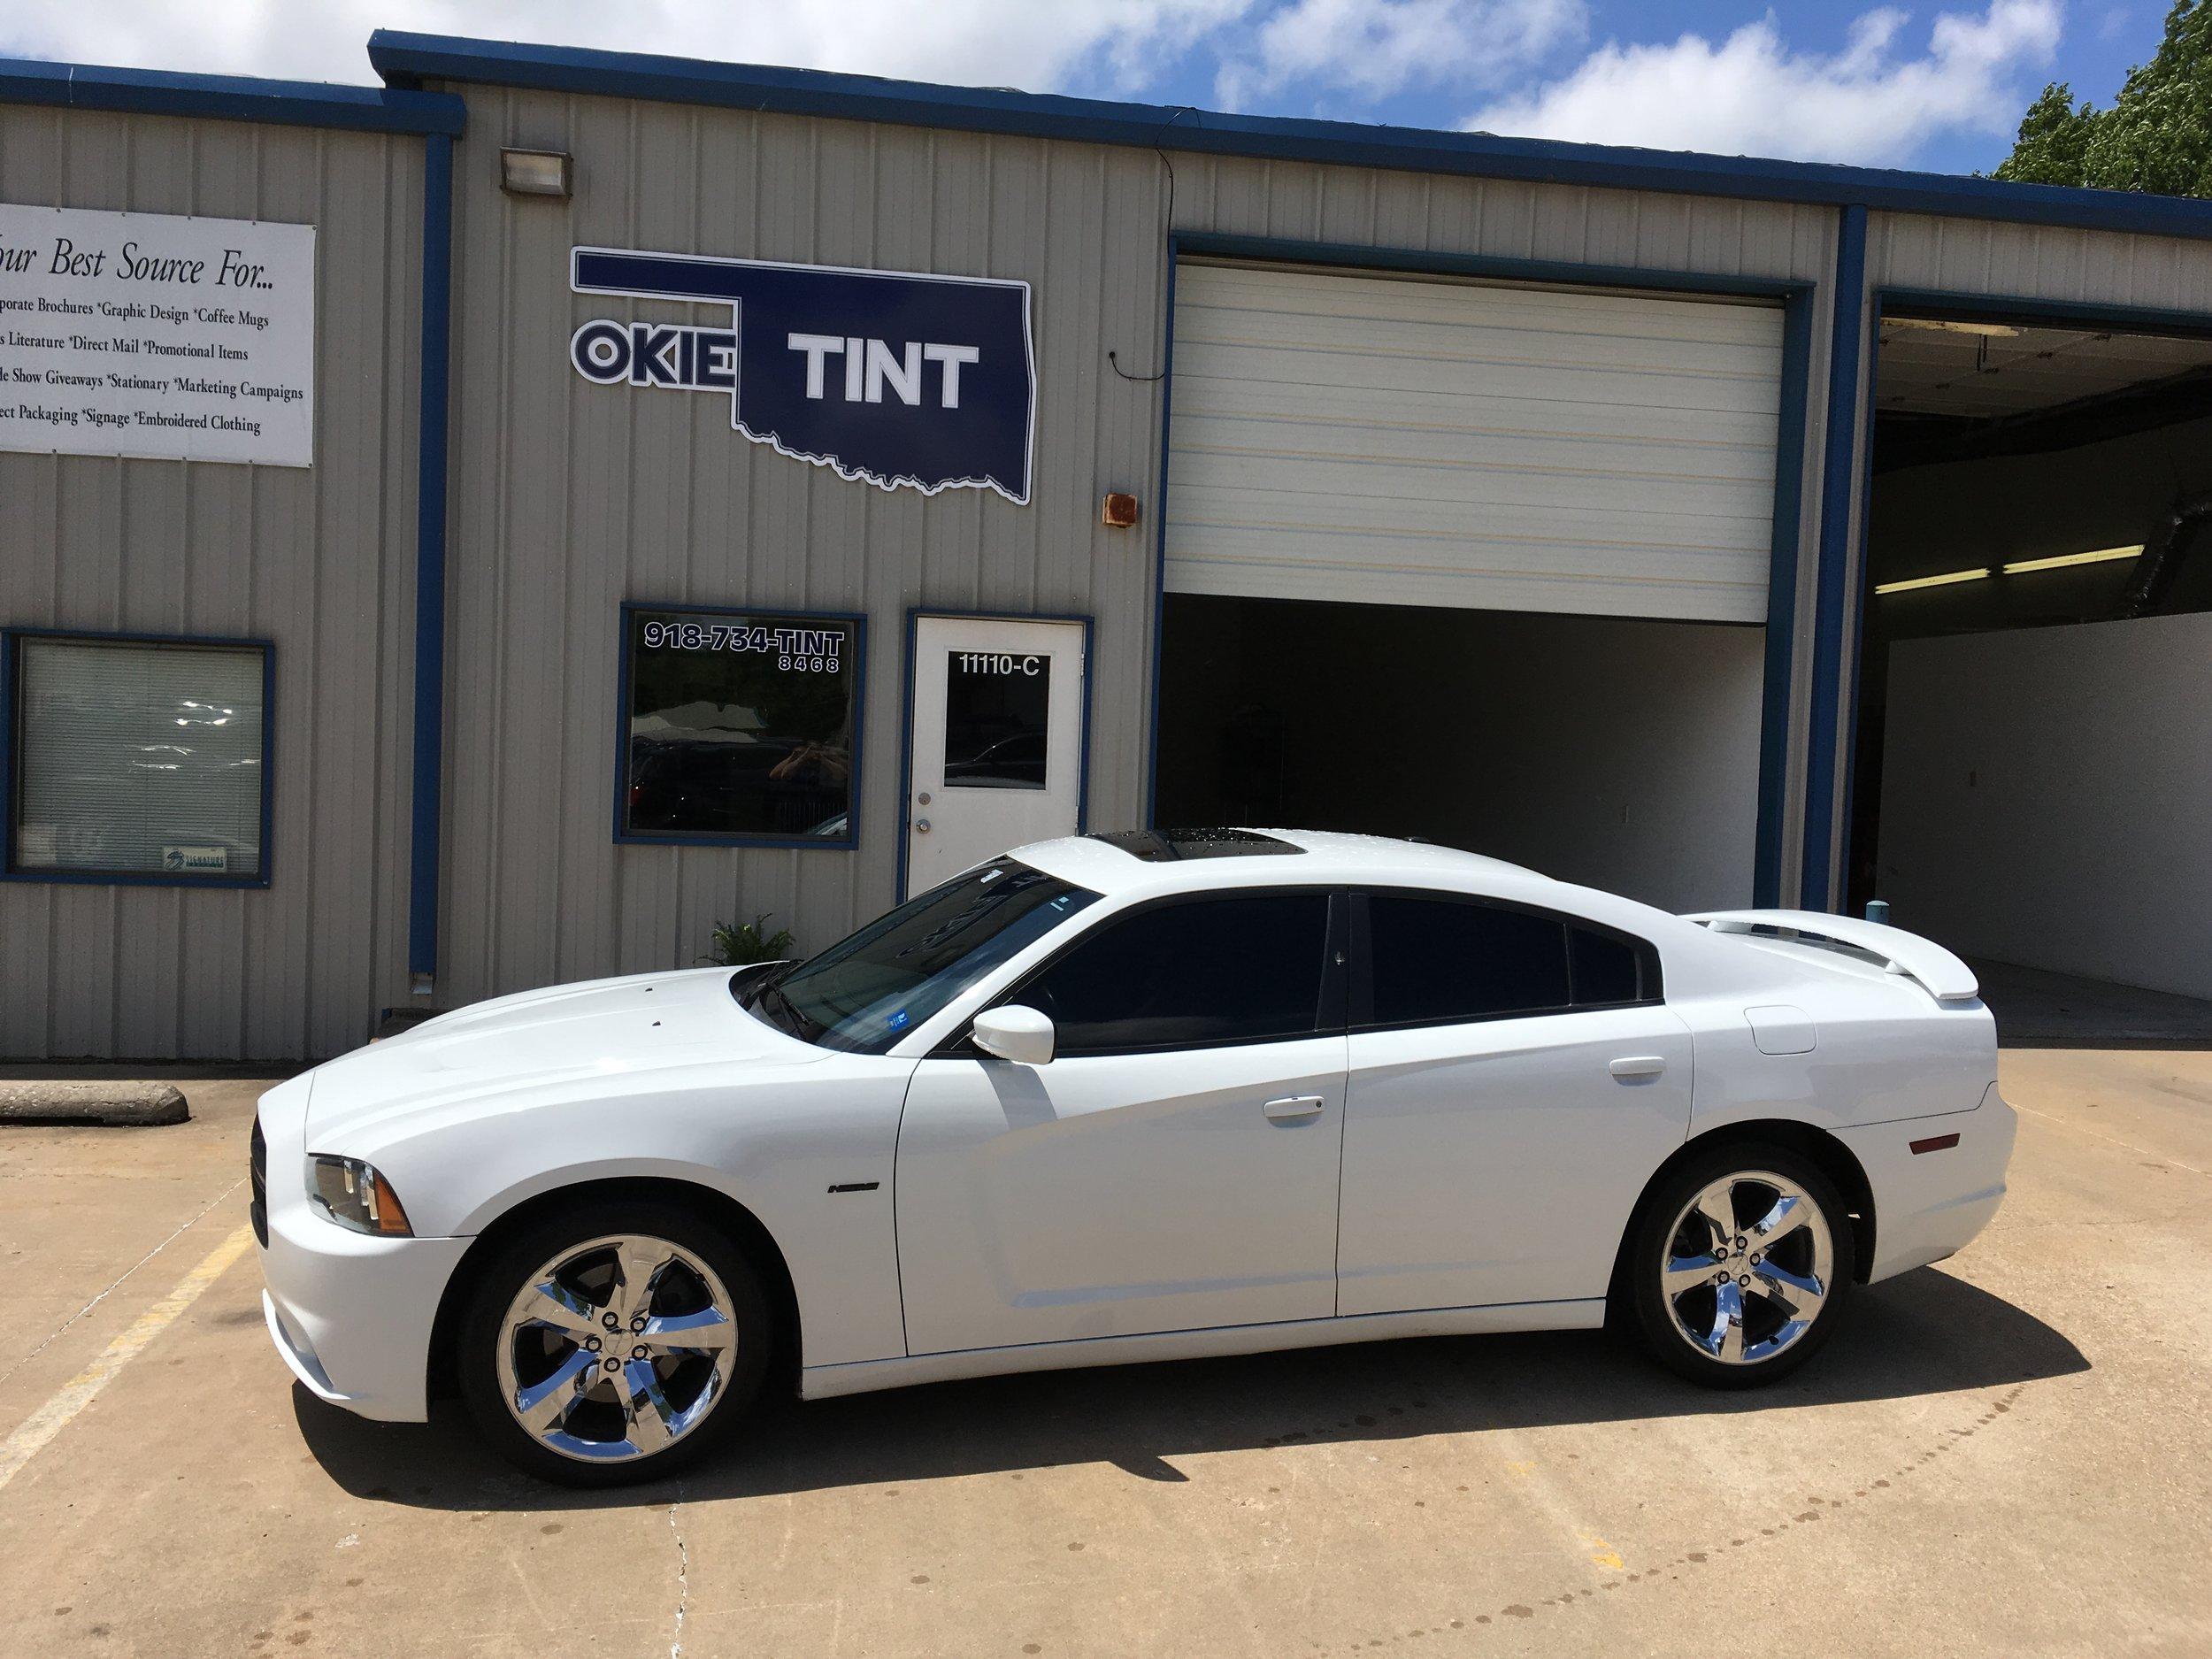 OkieTint Window Tint White Car.JPG